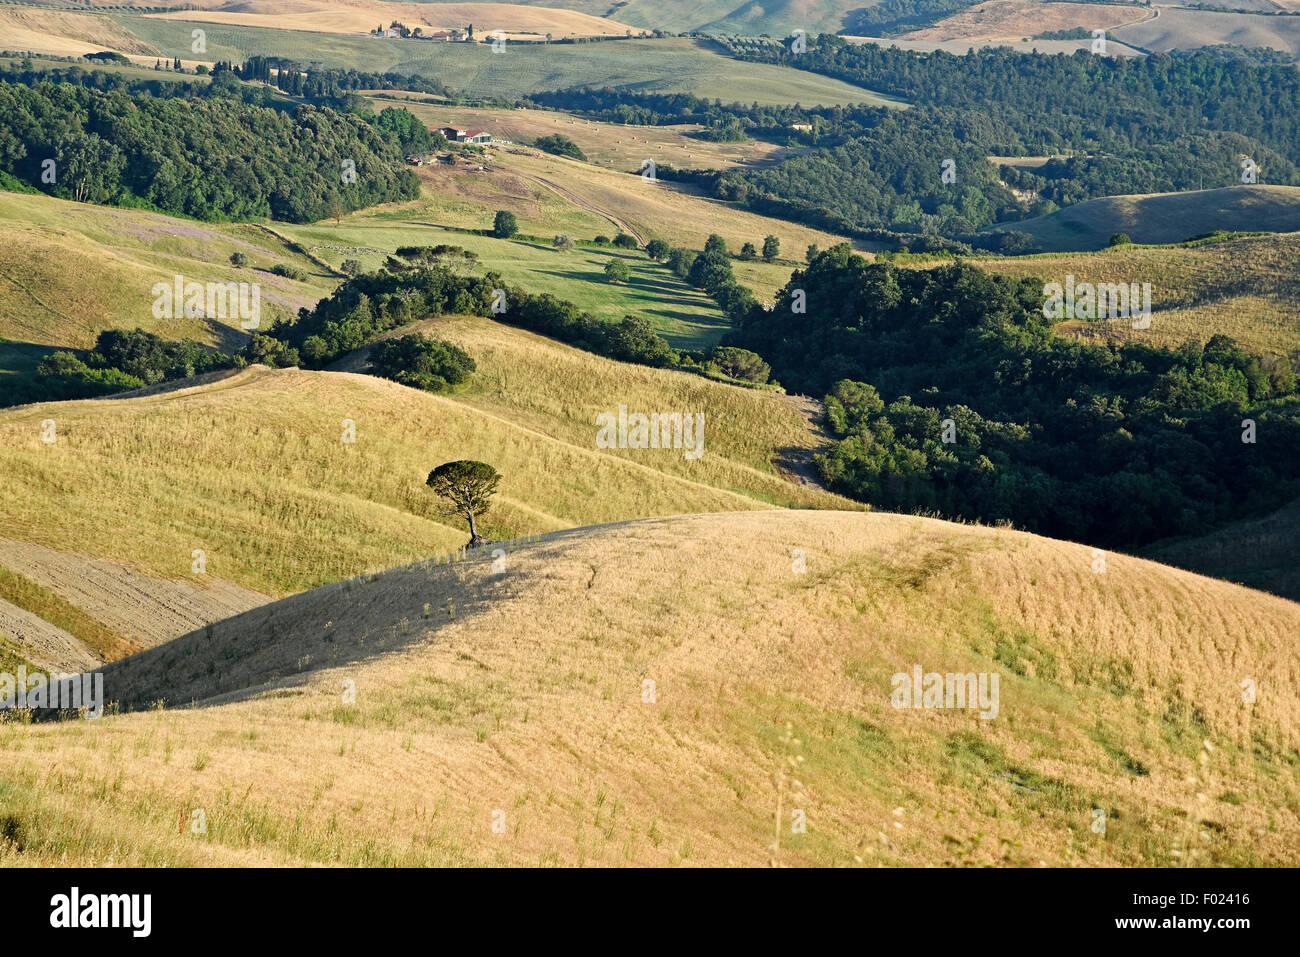 Landscape, Volterra, Province of Pisa, Tuscany, Italy Stock Photo